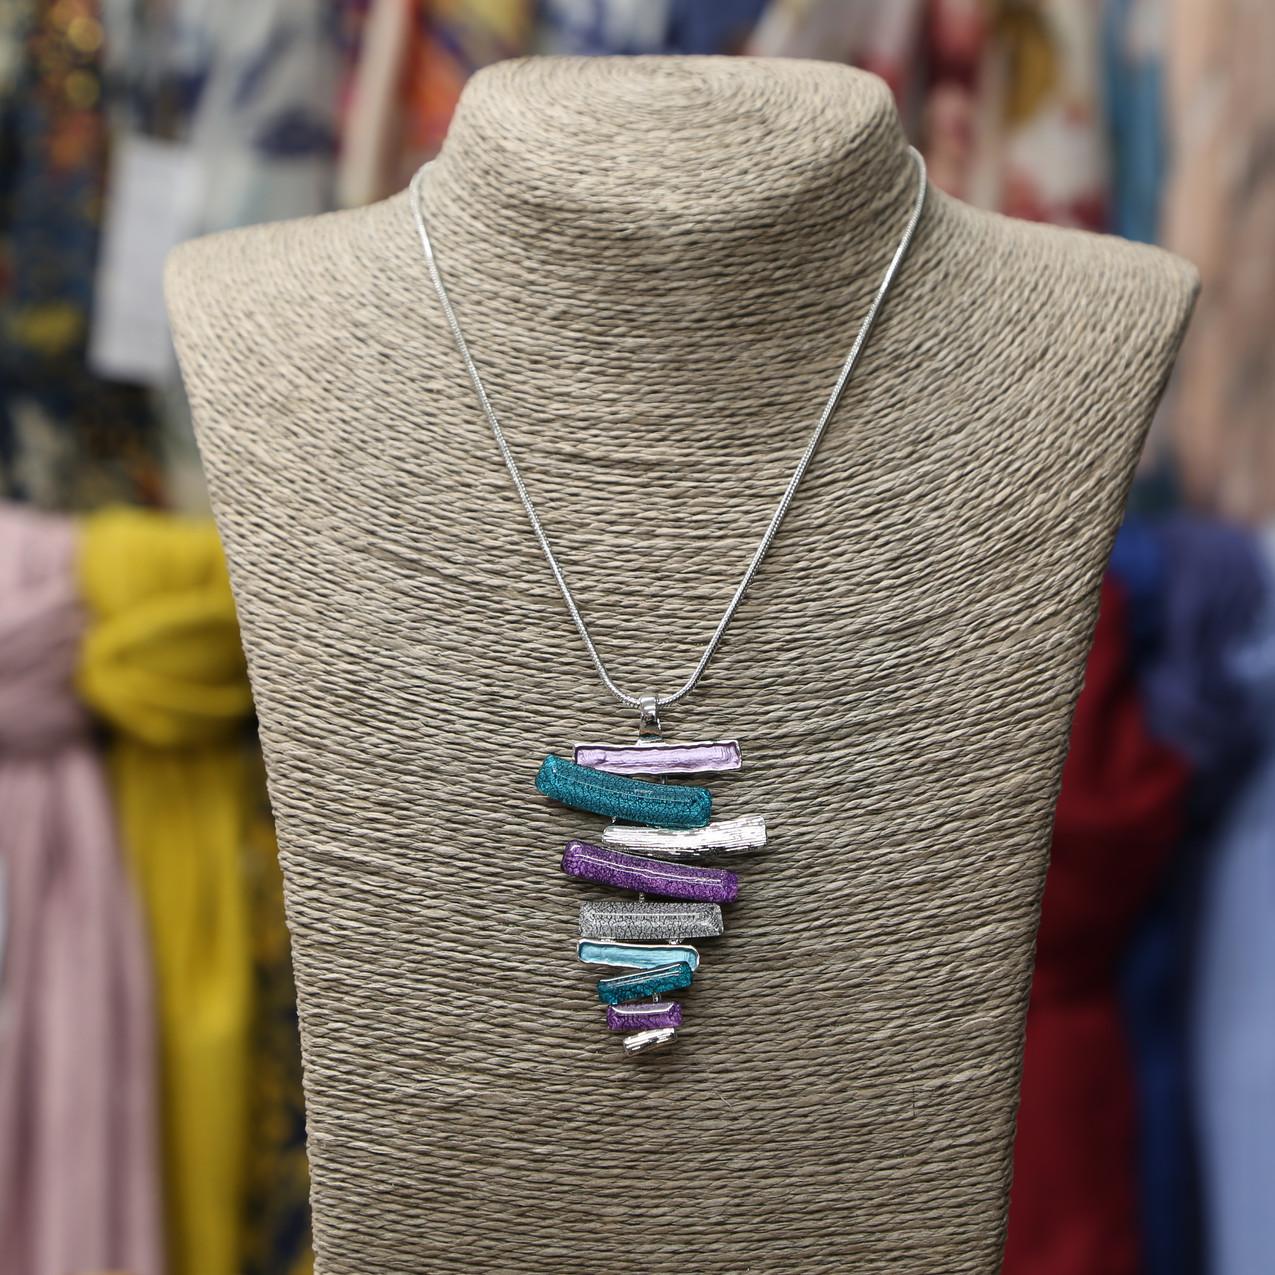 Patterned necklace